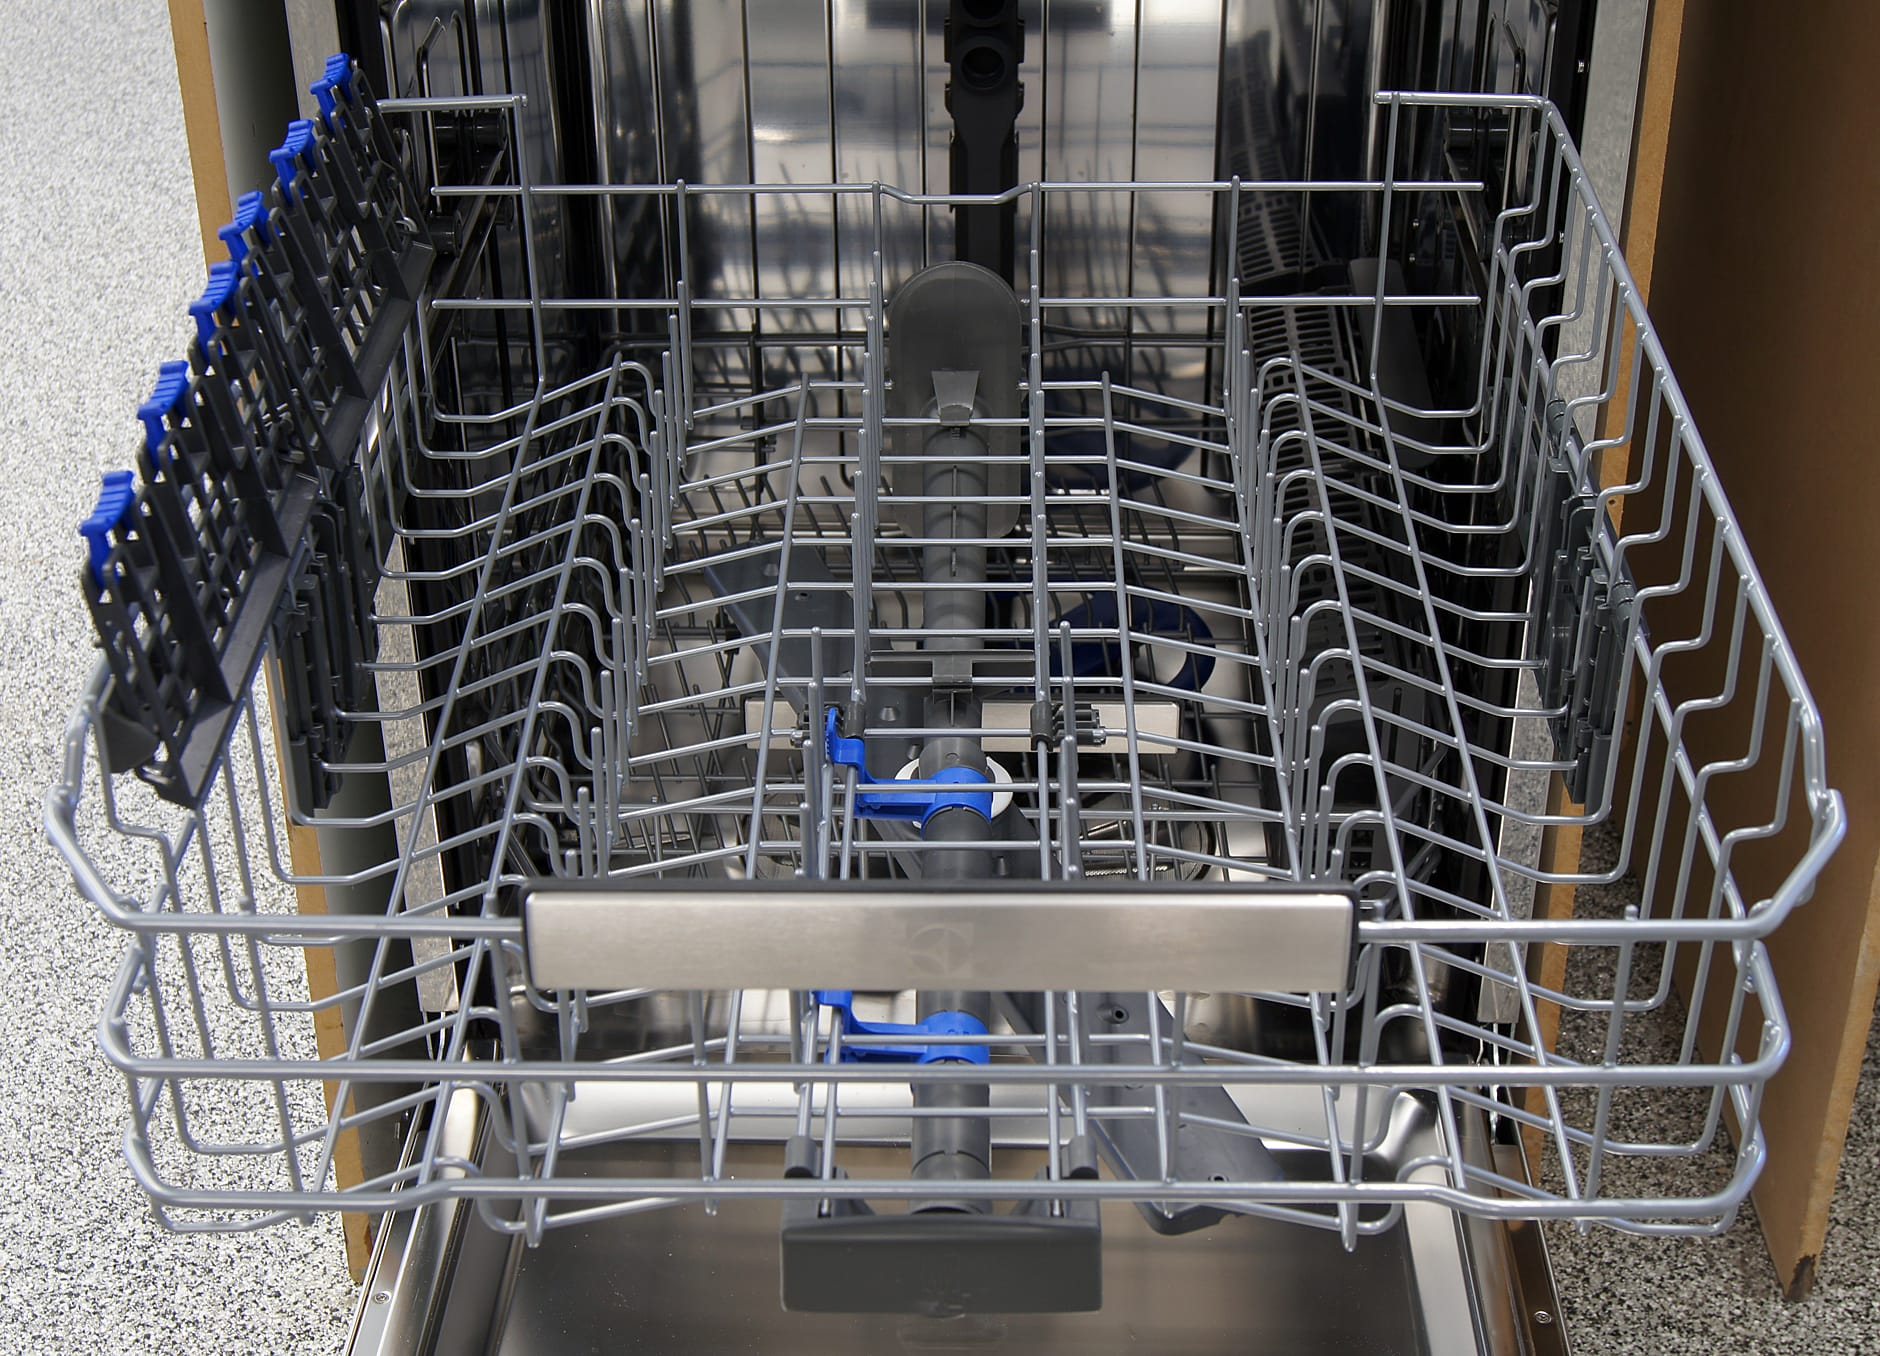 Electrolux EI24ID30QS top rack